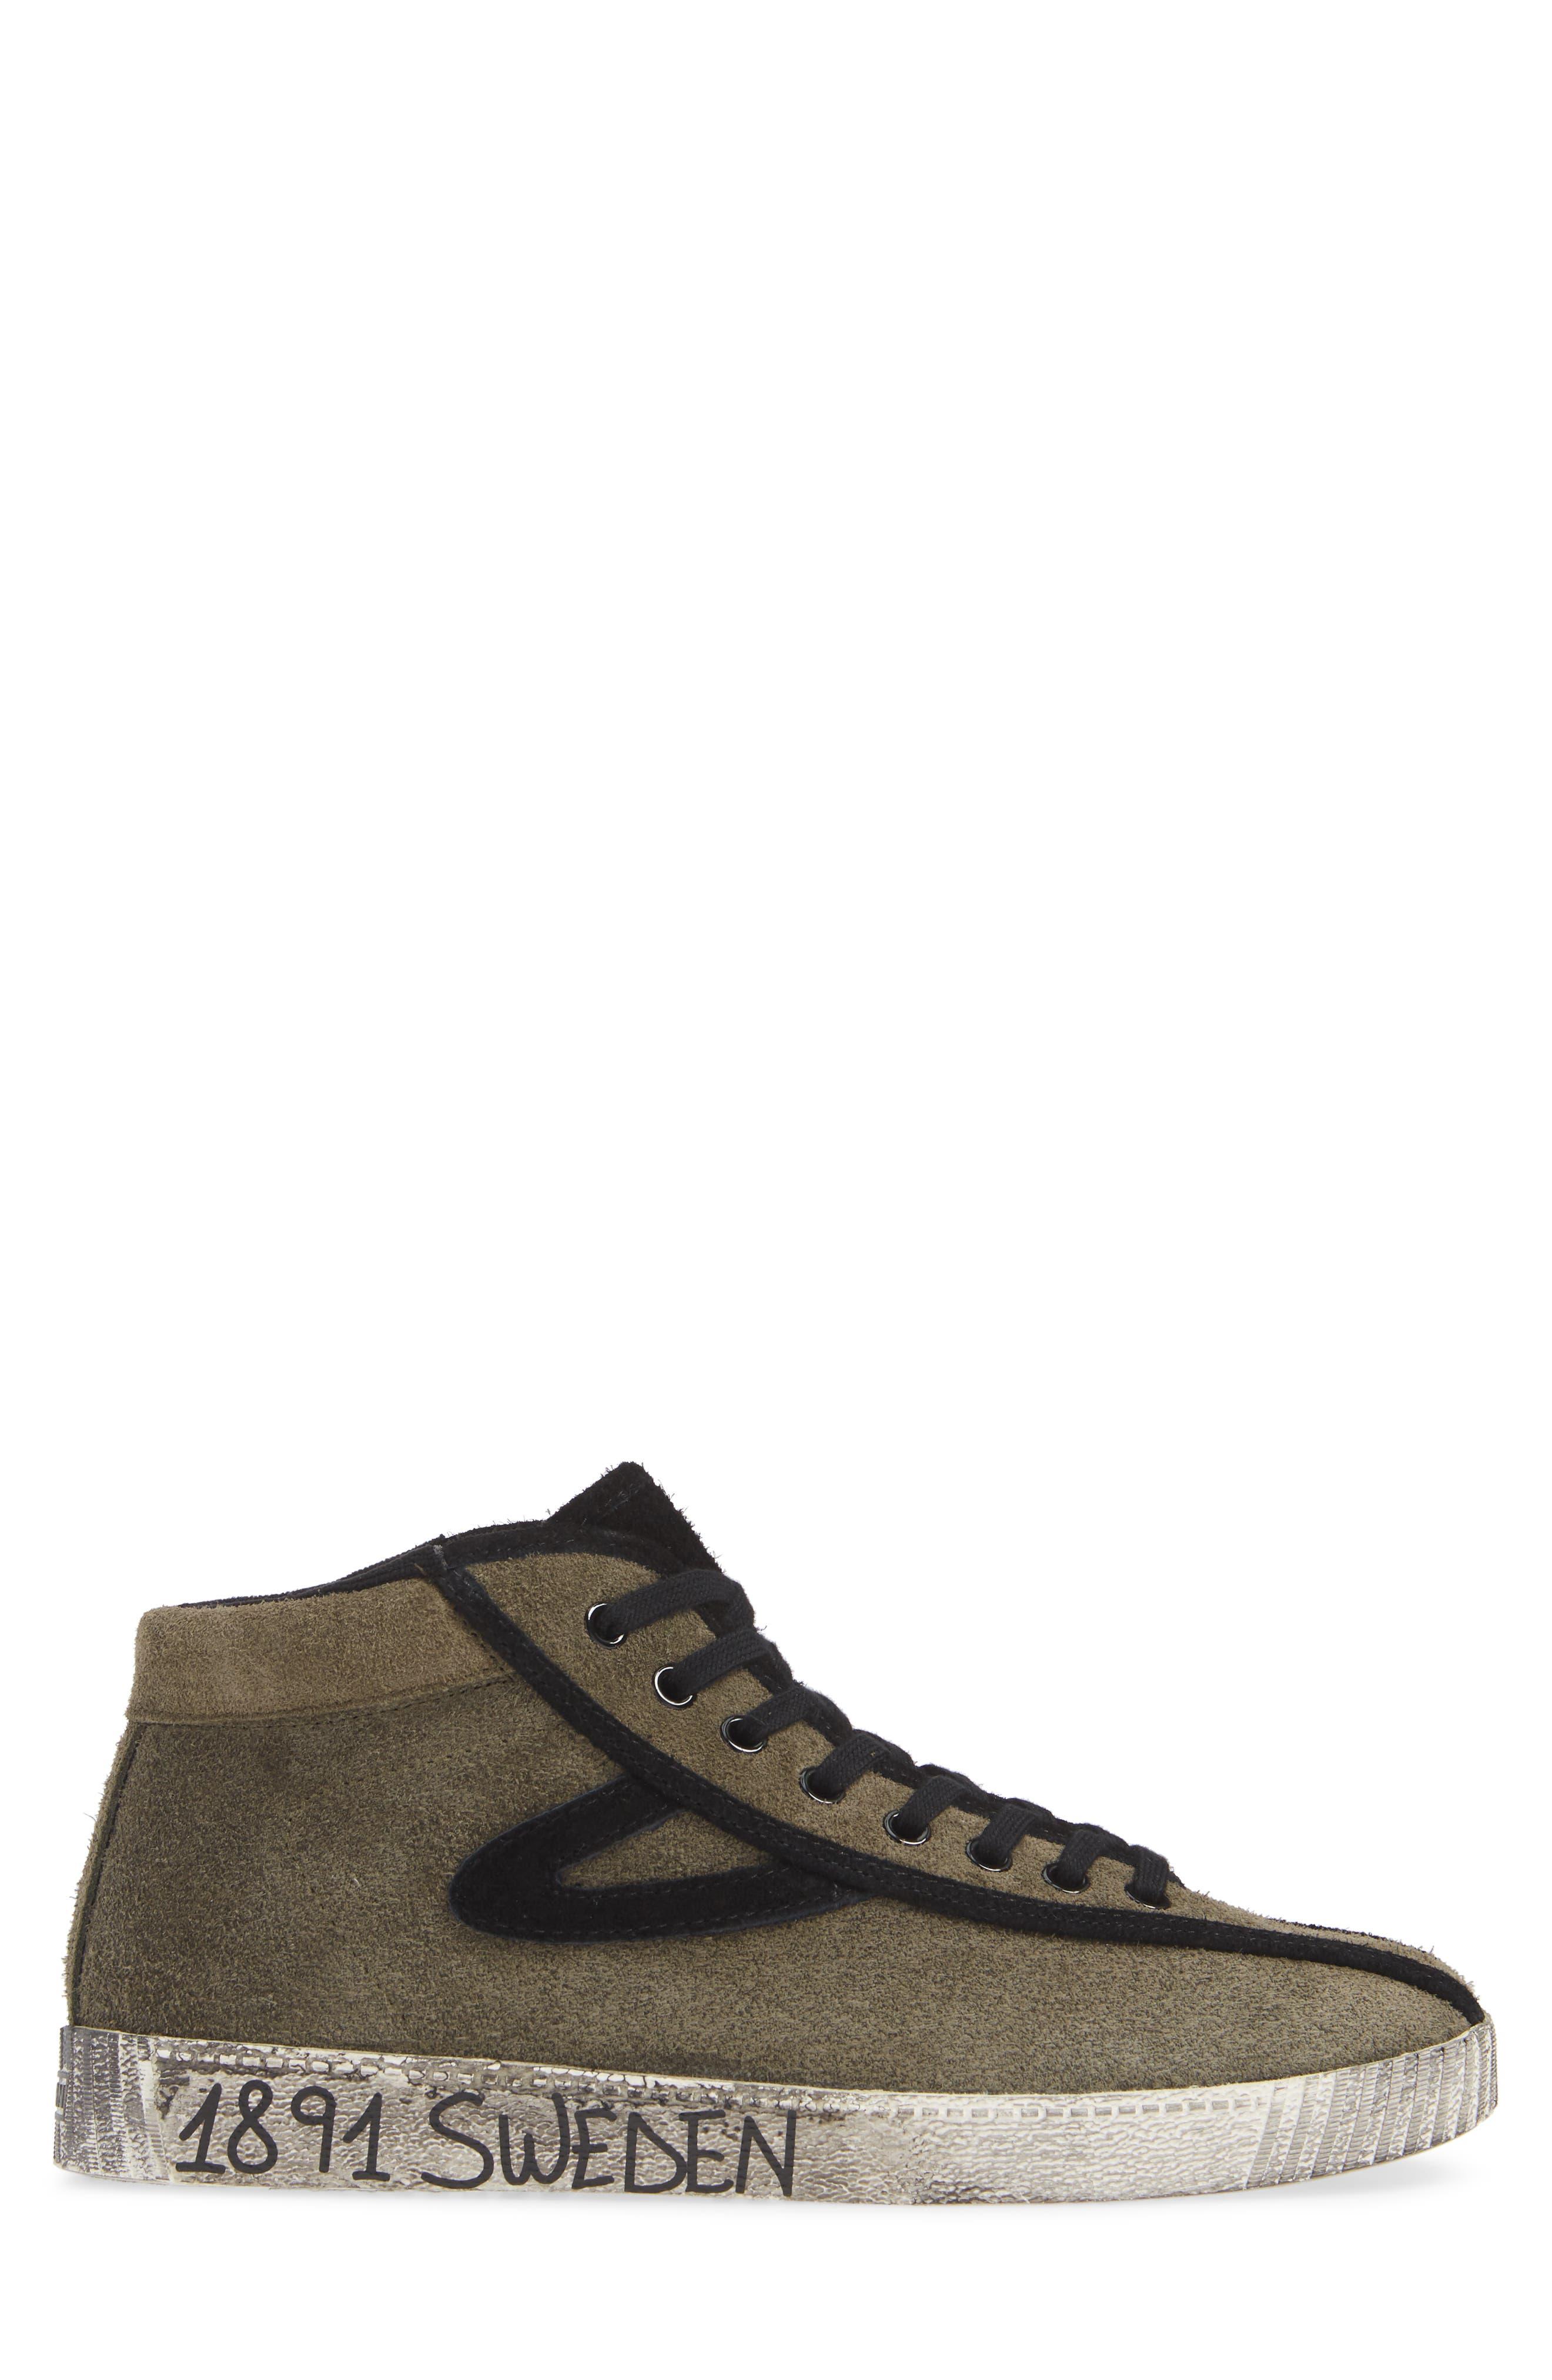 Nylite Hi 21 High Top Sneaker,                             Alternate thumbnail 3, color,                             OLIVE/ BLACK SUEDE